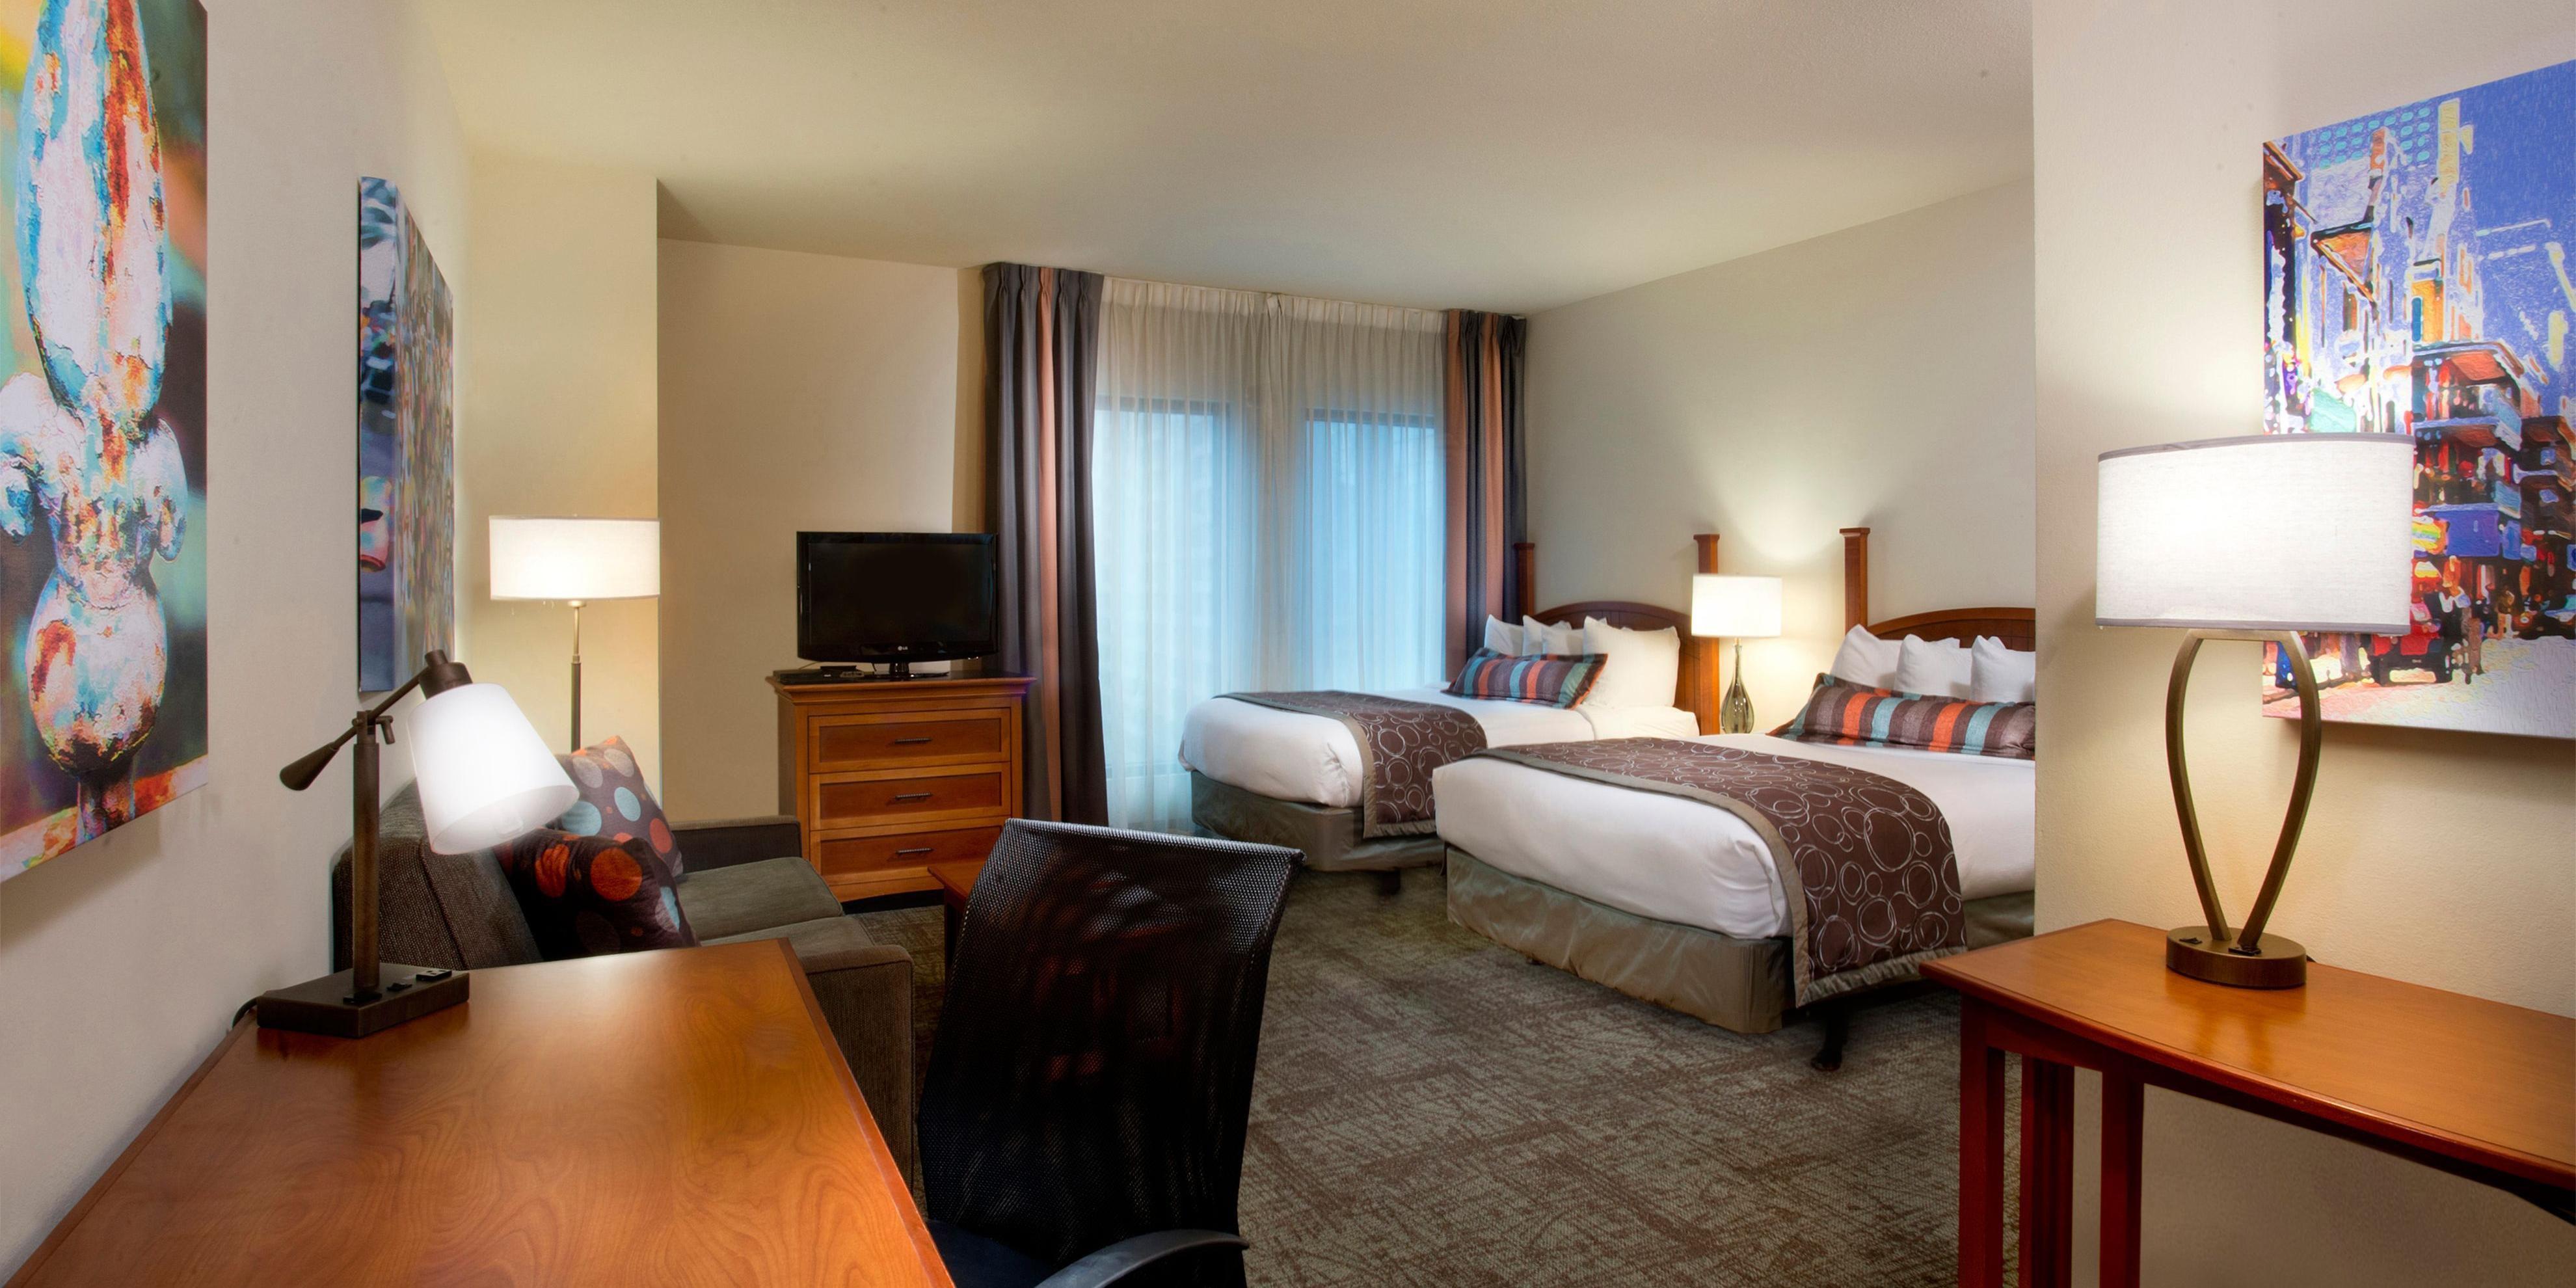 suites in clsc hotels renaissance new suite rooms msydt bedroom orleans hotel arts hor garden warehouse district